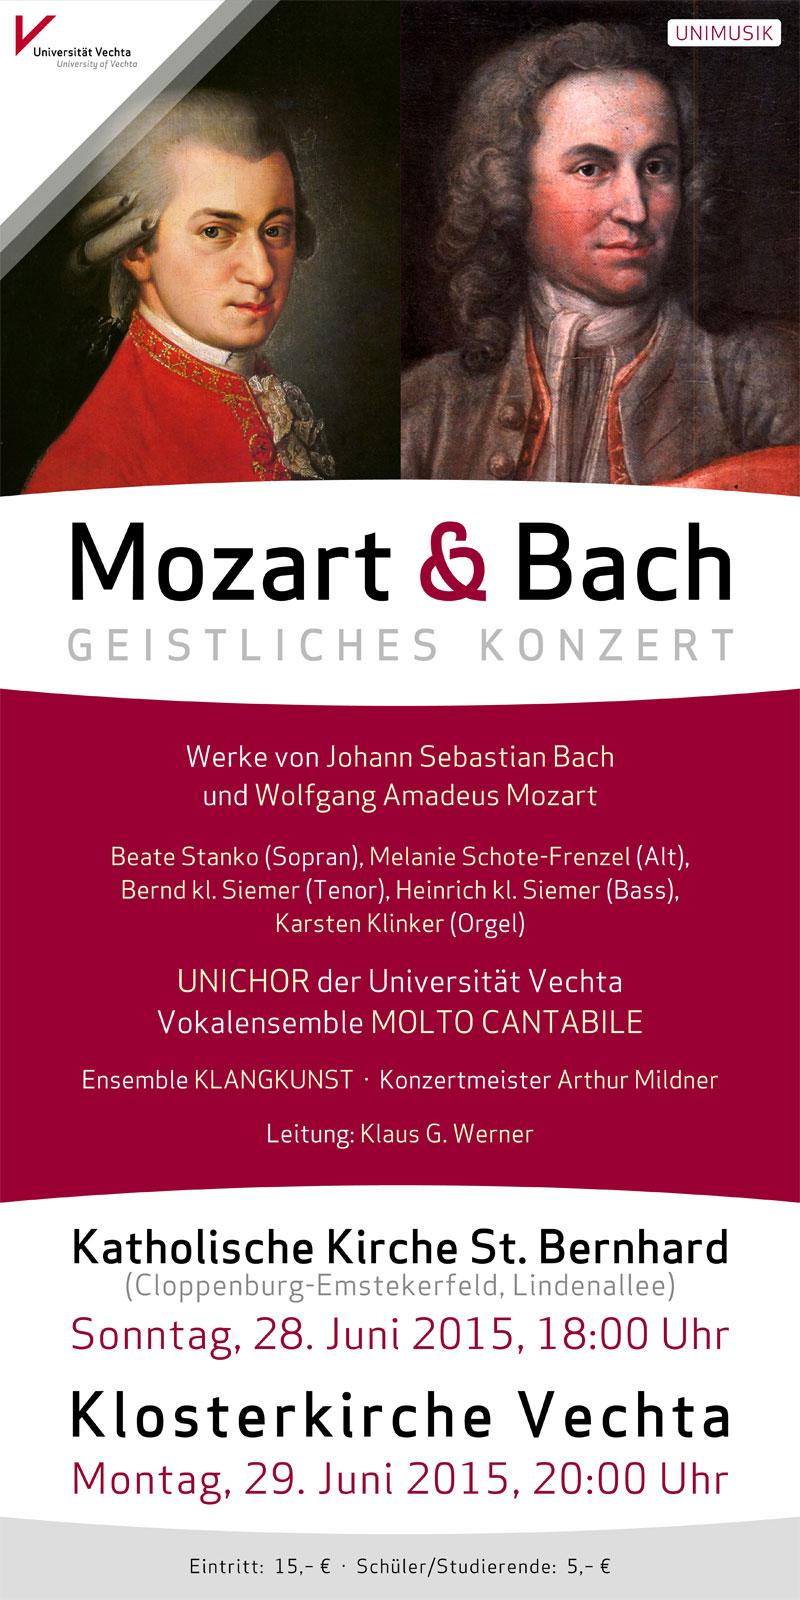 Mozart & Bach · UNIMUSIK · Universität Vechta